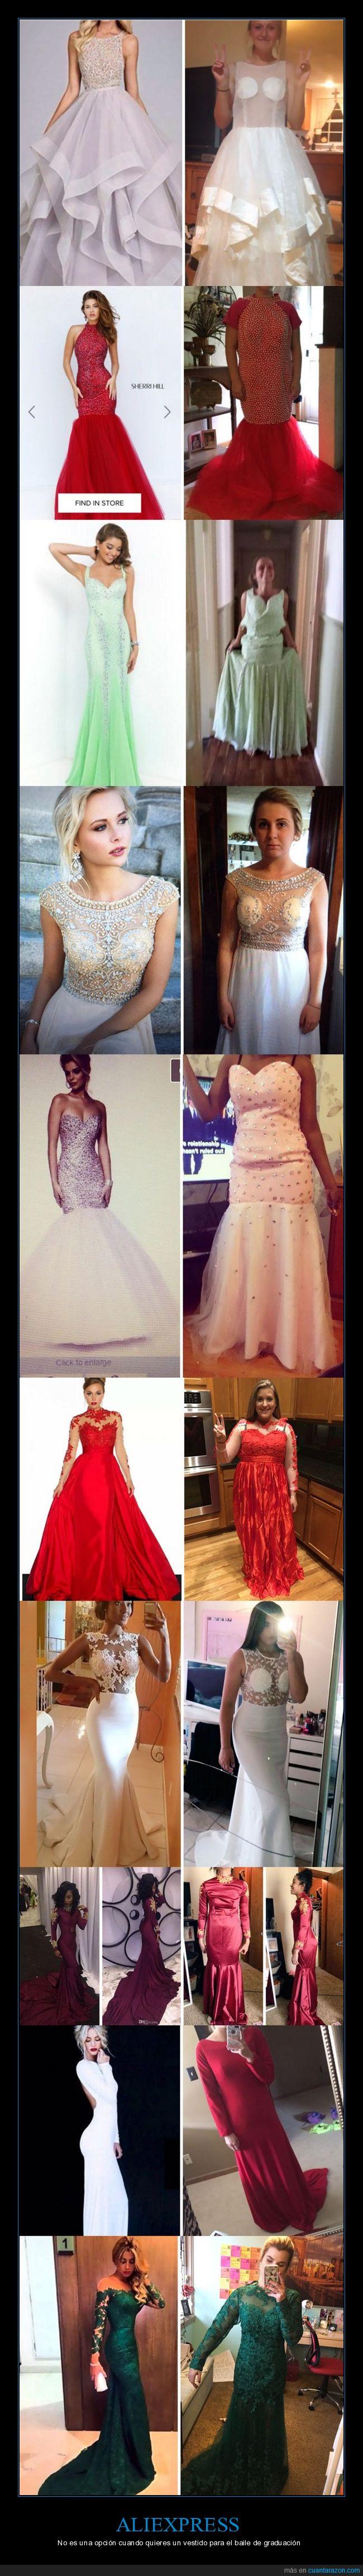 aliexpress,fail,graduación,prom,vestidos